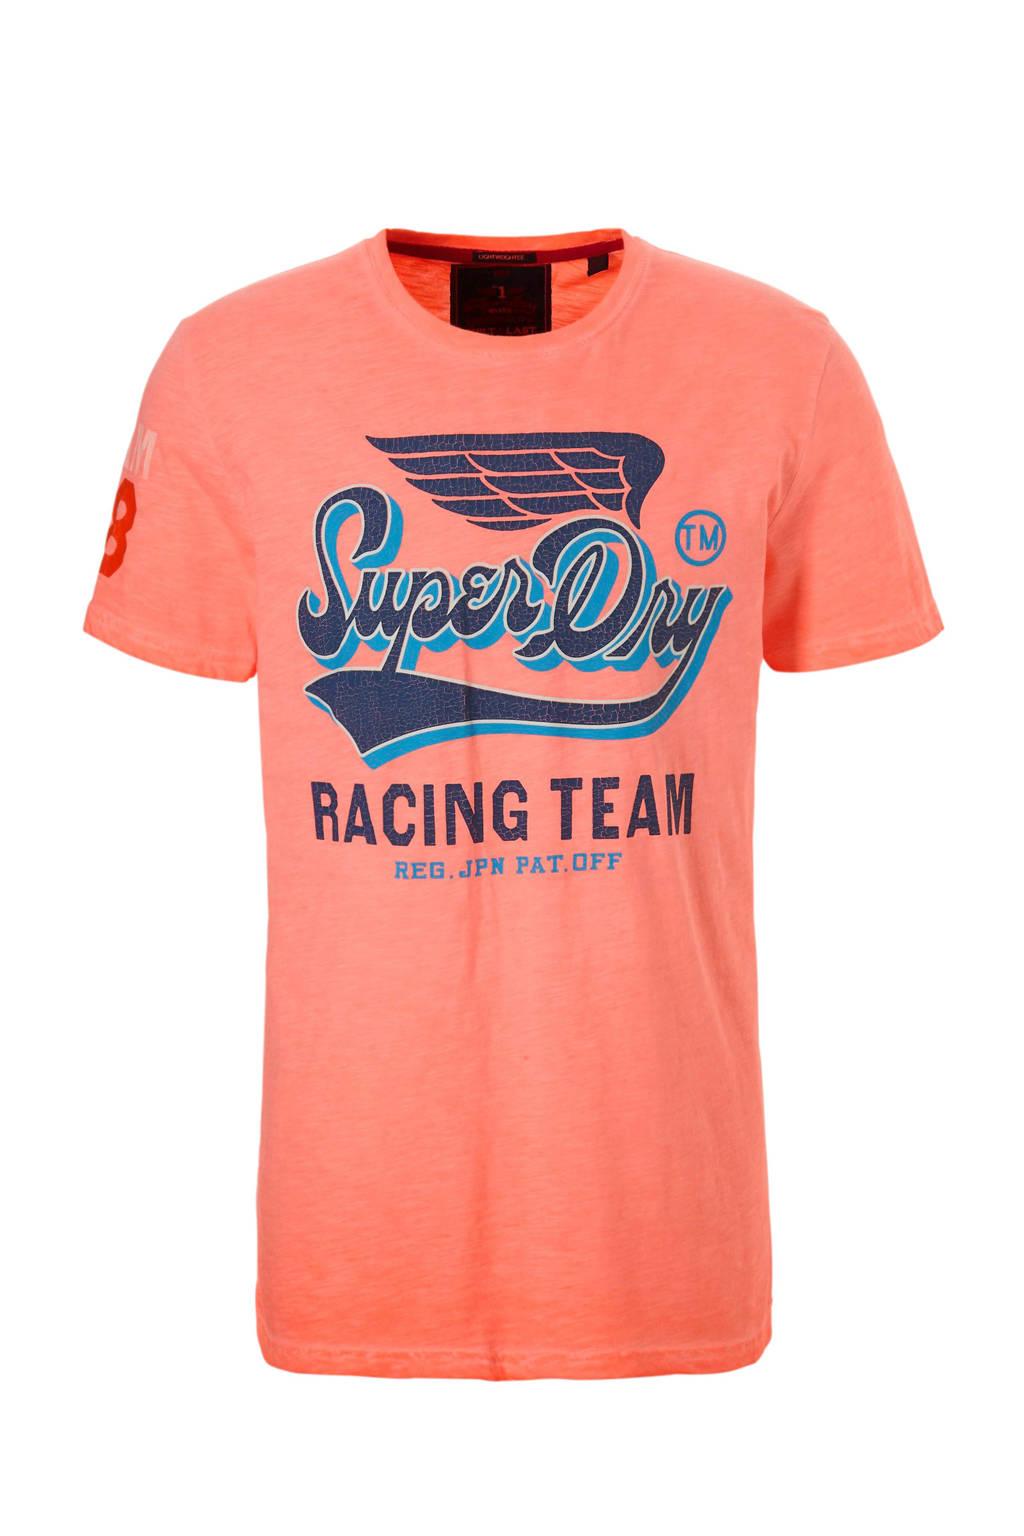 Superdry T-shirt met opdruk, Oranje